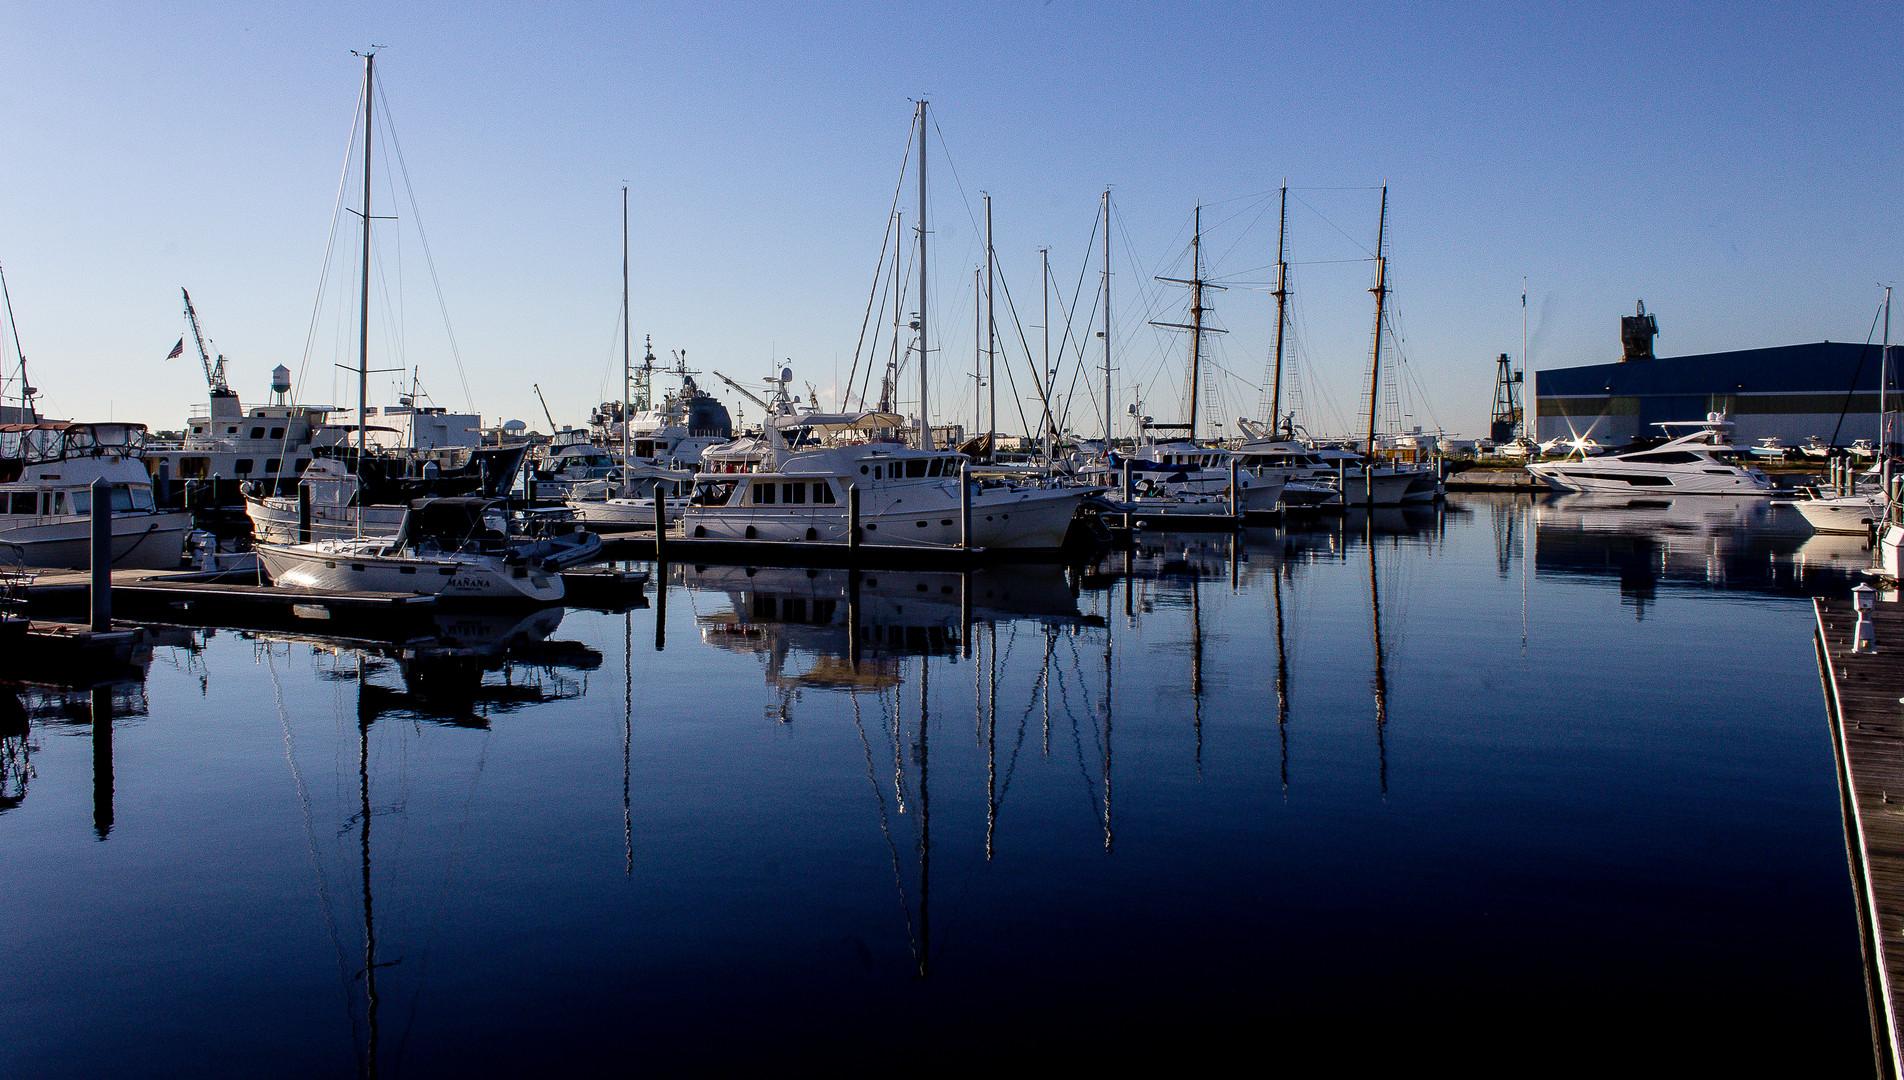 The Dock_5741.jpg